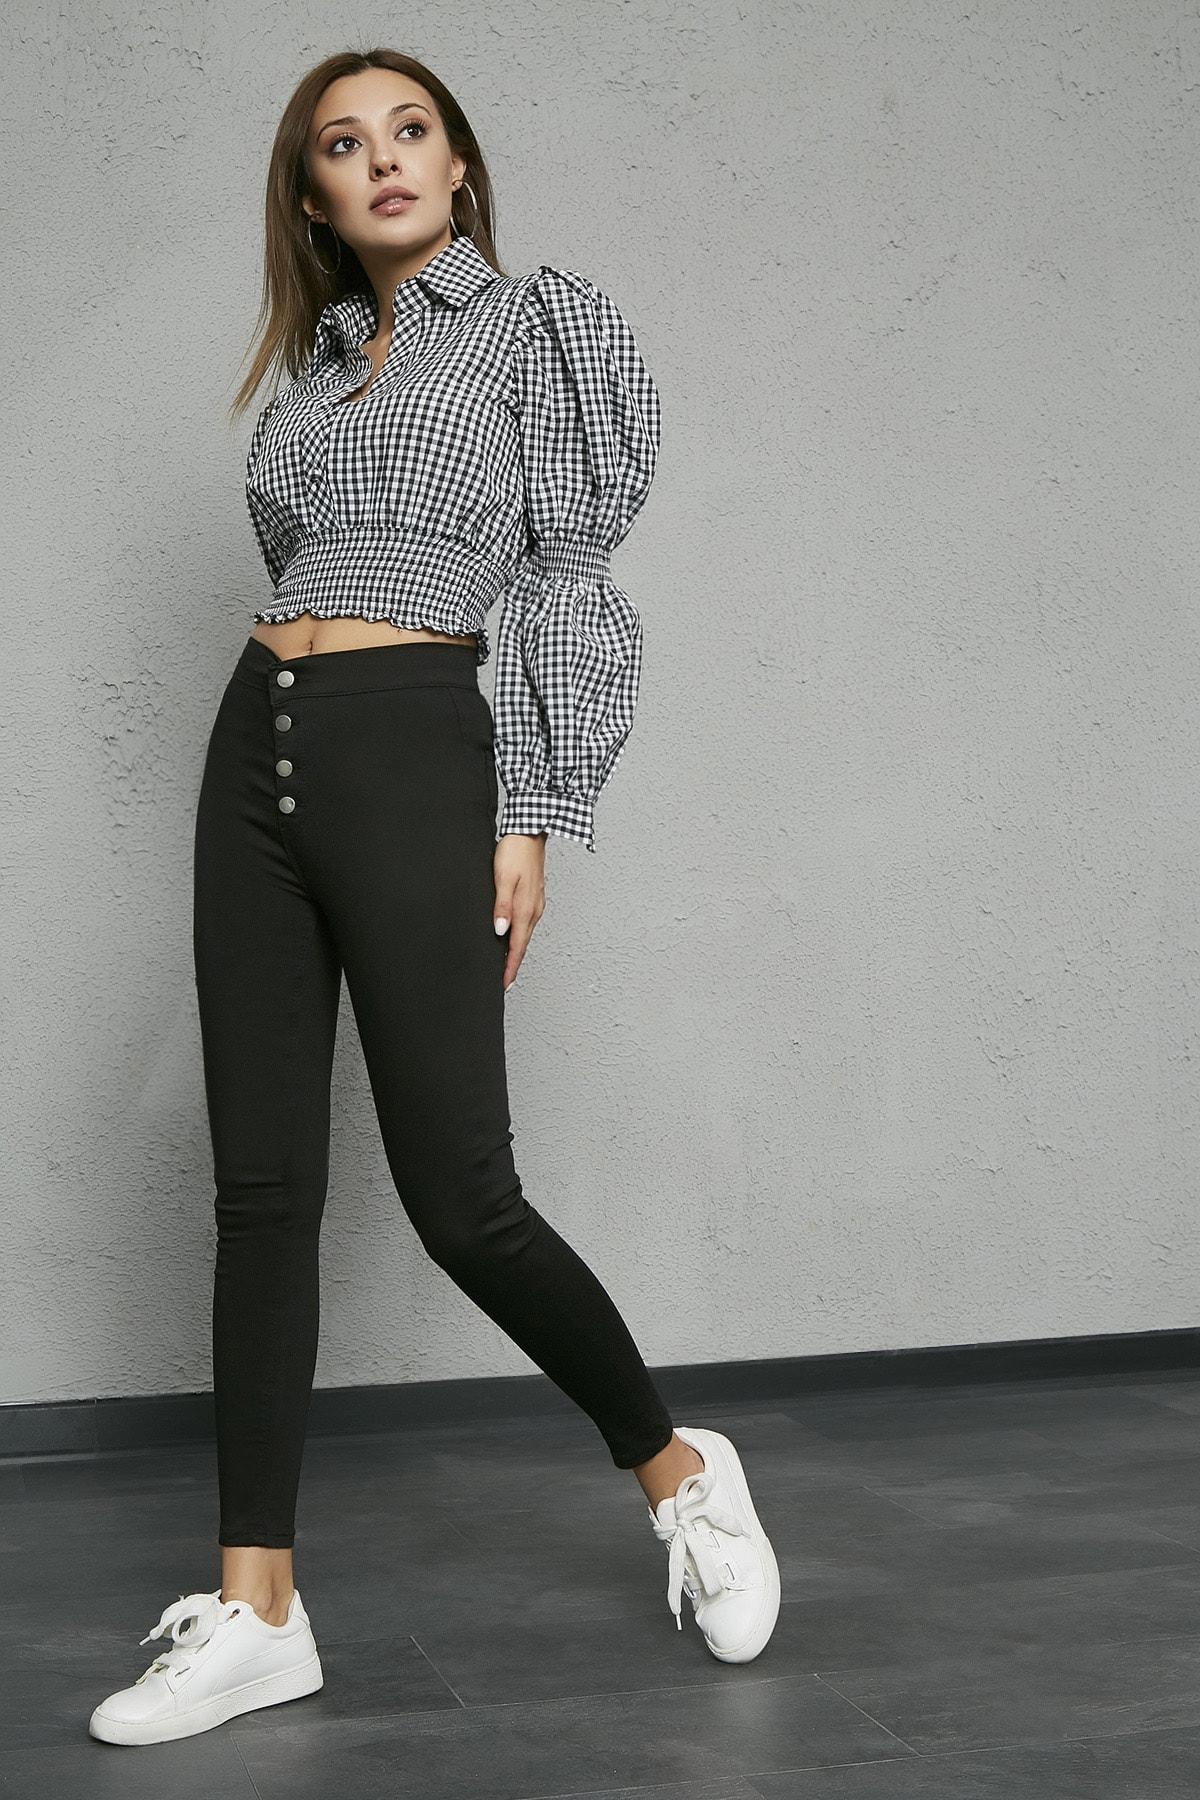 Sateen Kadın Siyah Düğme Detay Cepli Pantolon Tayt 2